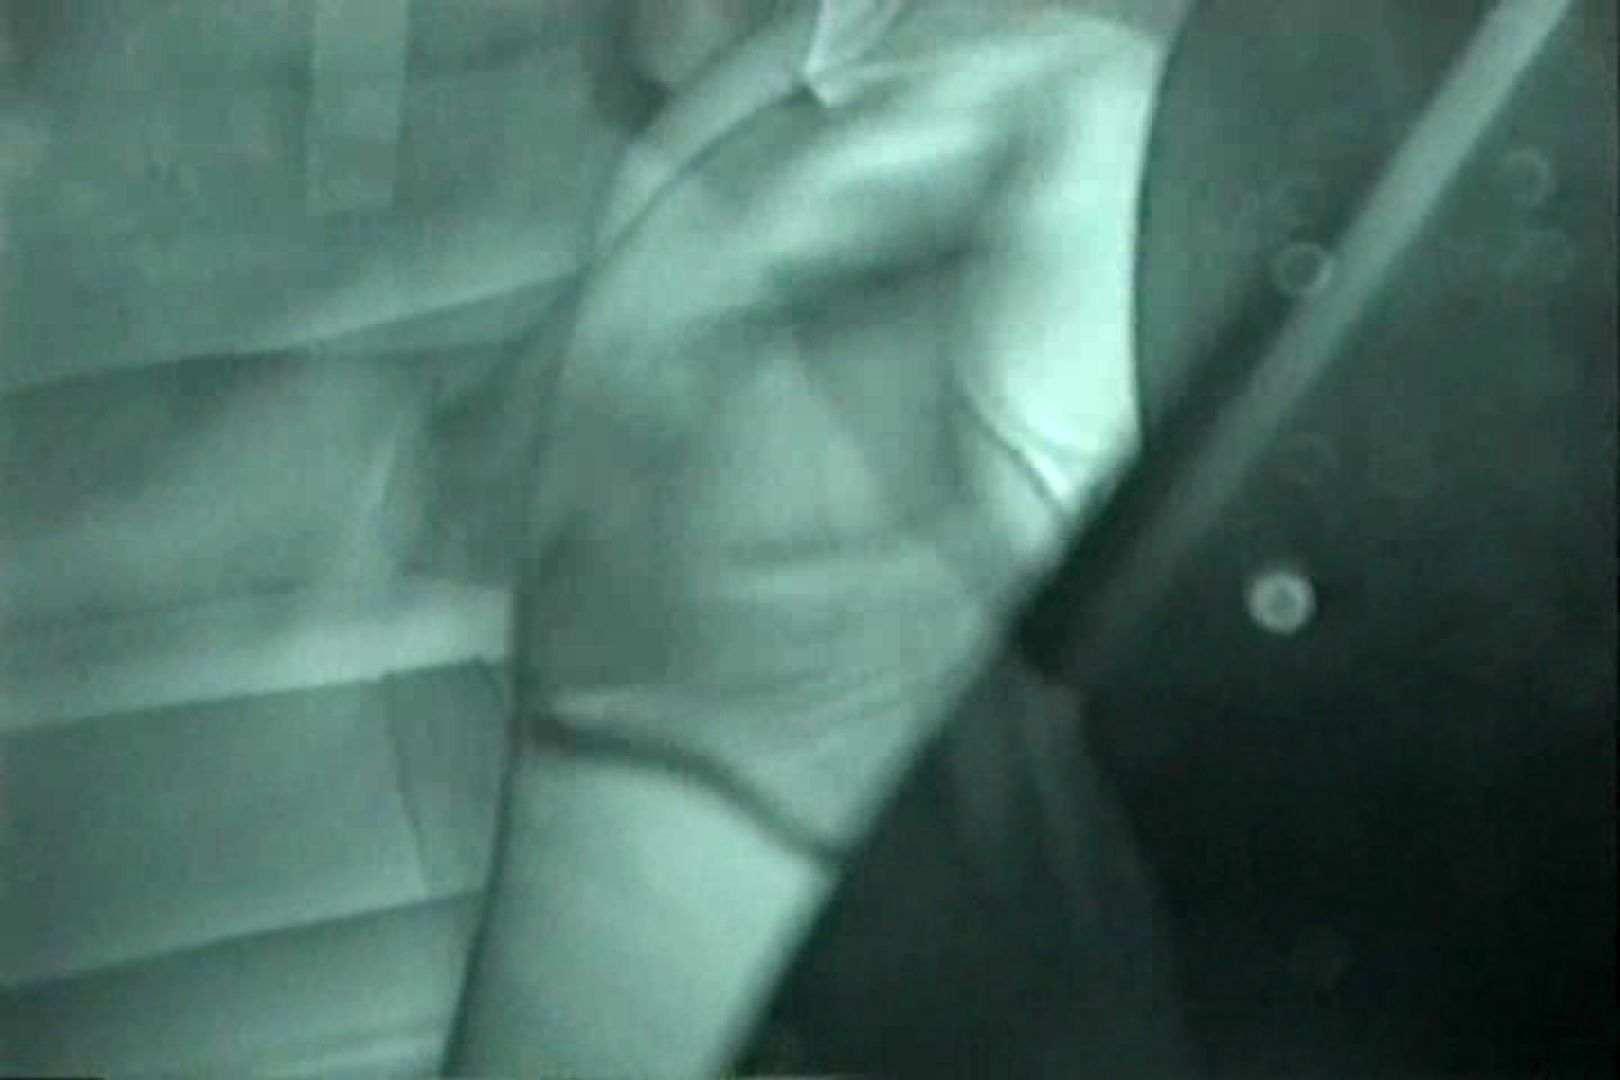 充血監督の深夜の運動会Vol.124 赤外線 盗撮オマンコ無修正動画無料 63画像 35